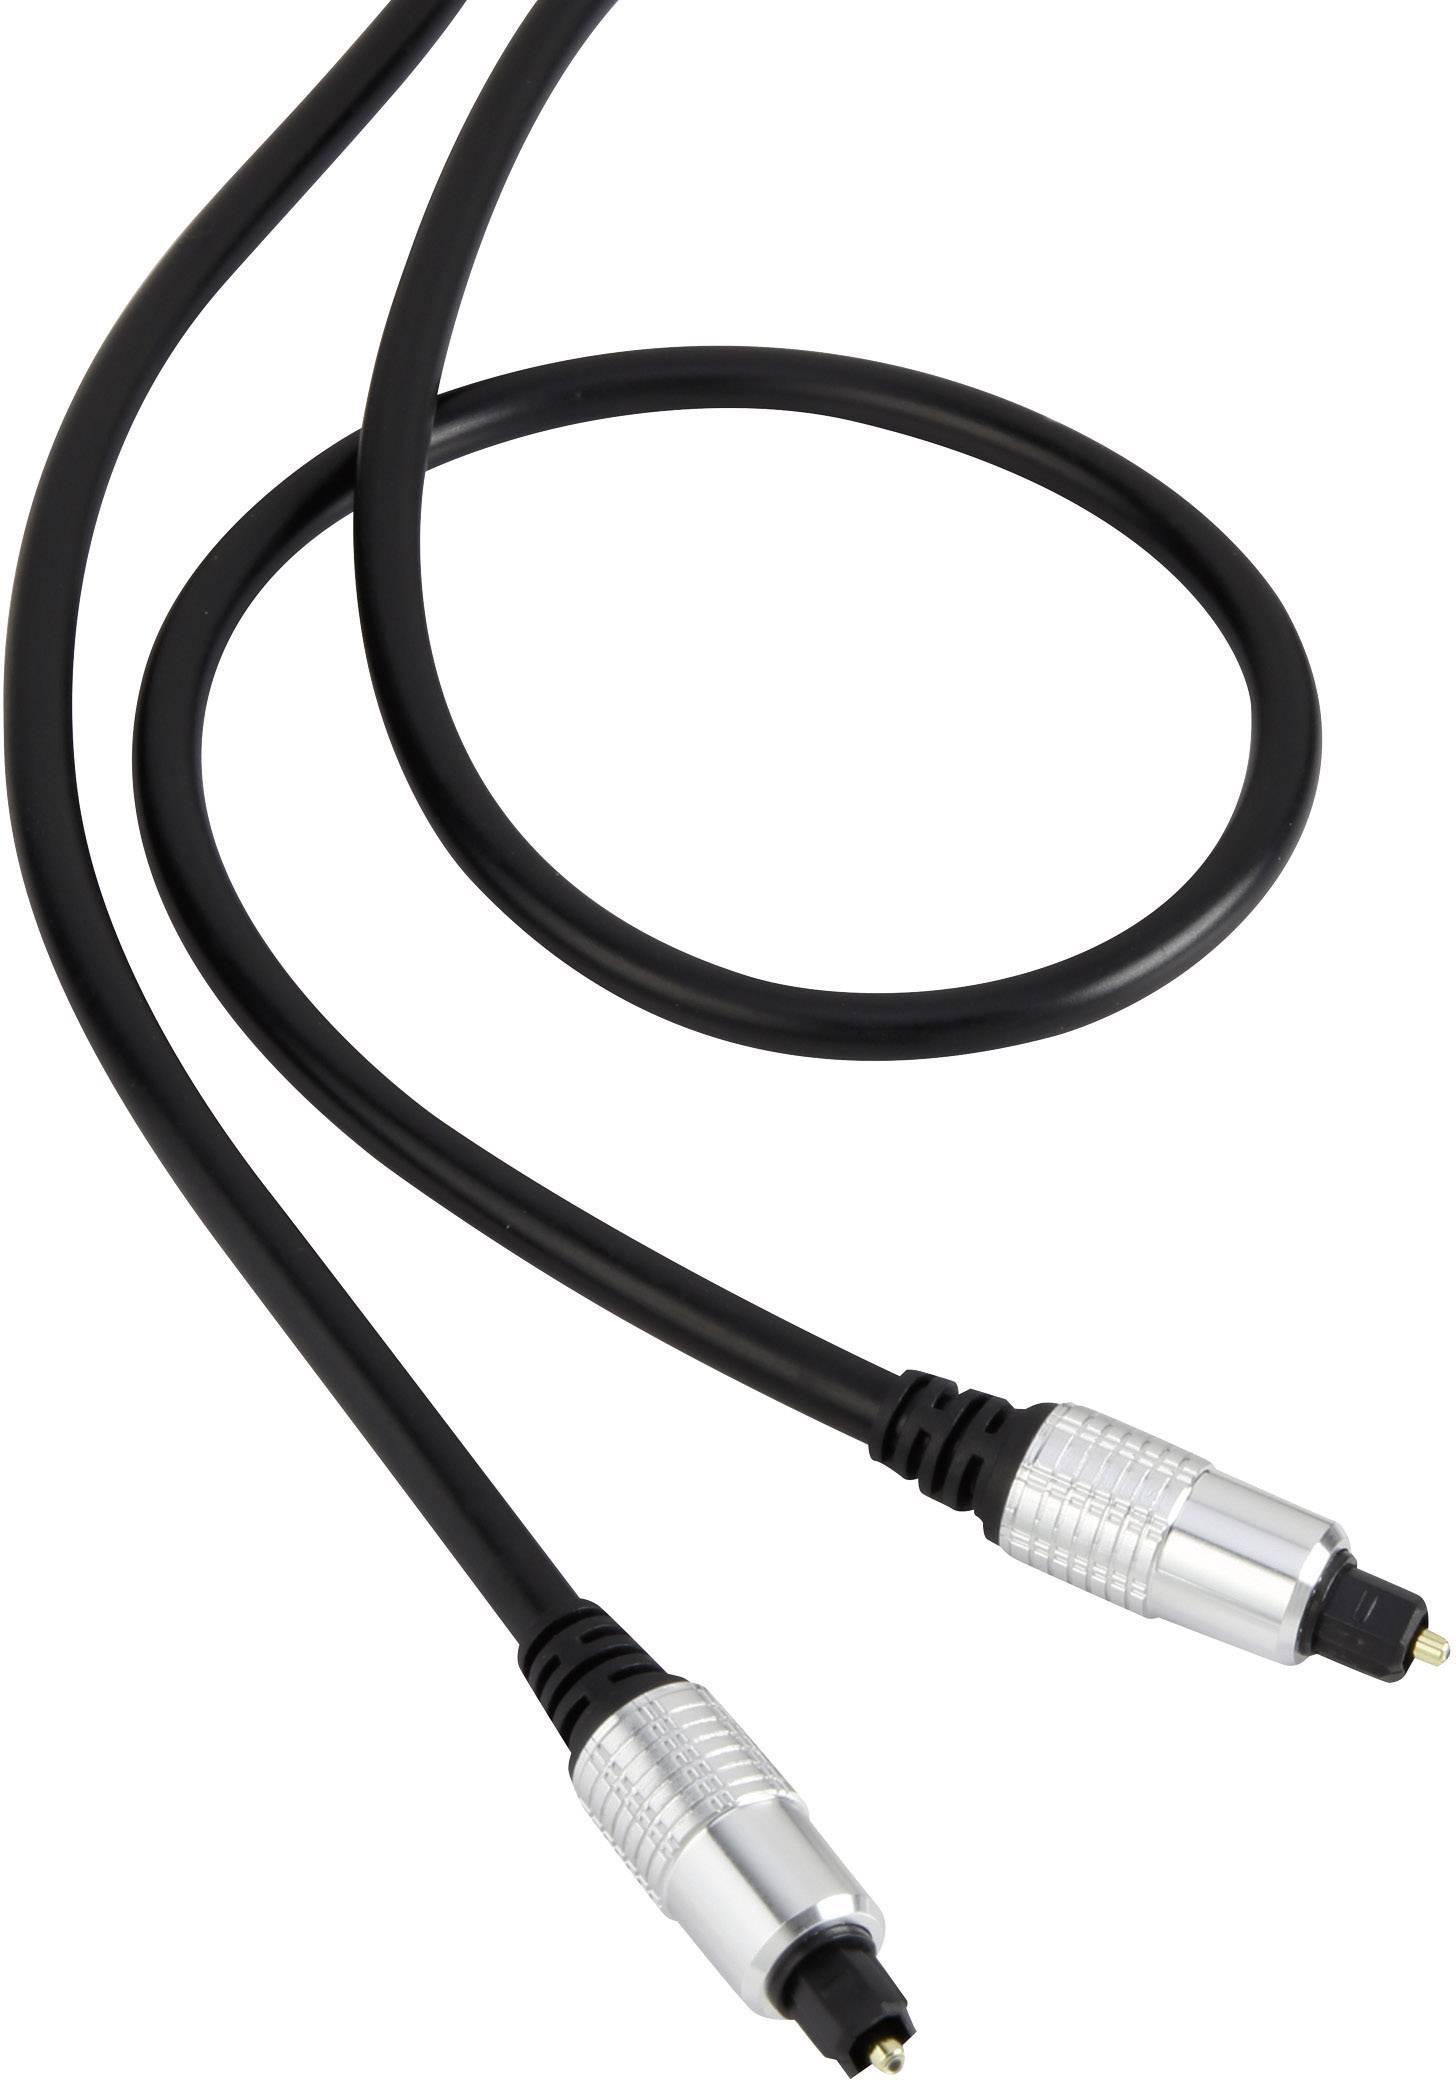 Digitálny audio kábel Toslink SpeaKa, 5 m, čierna